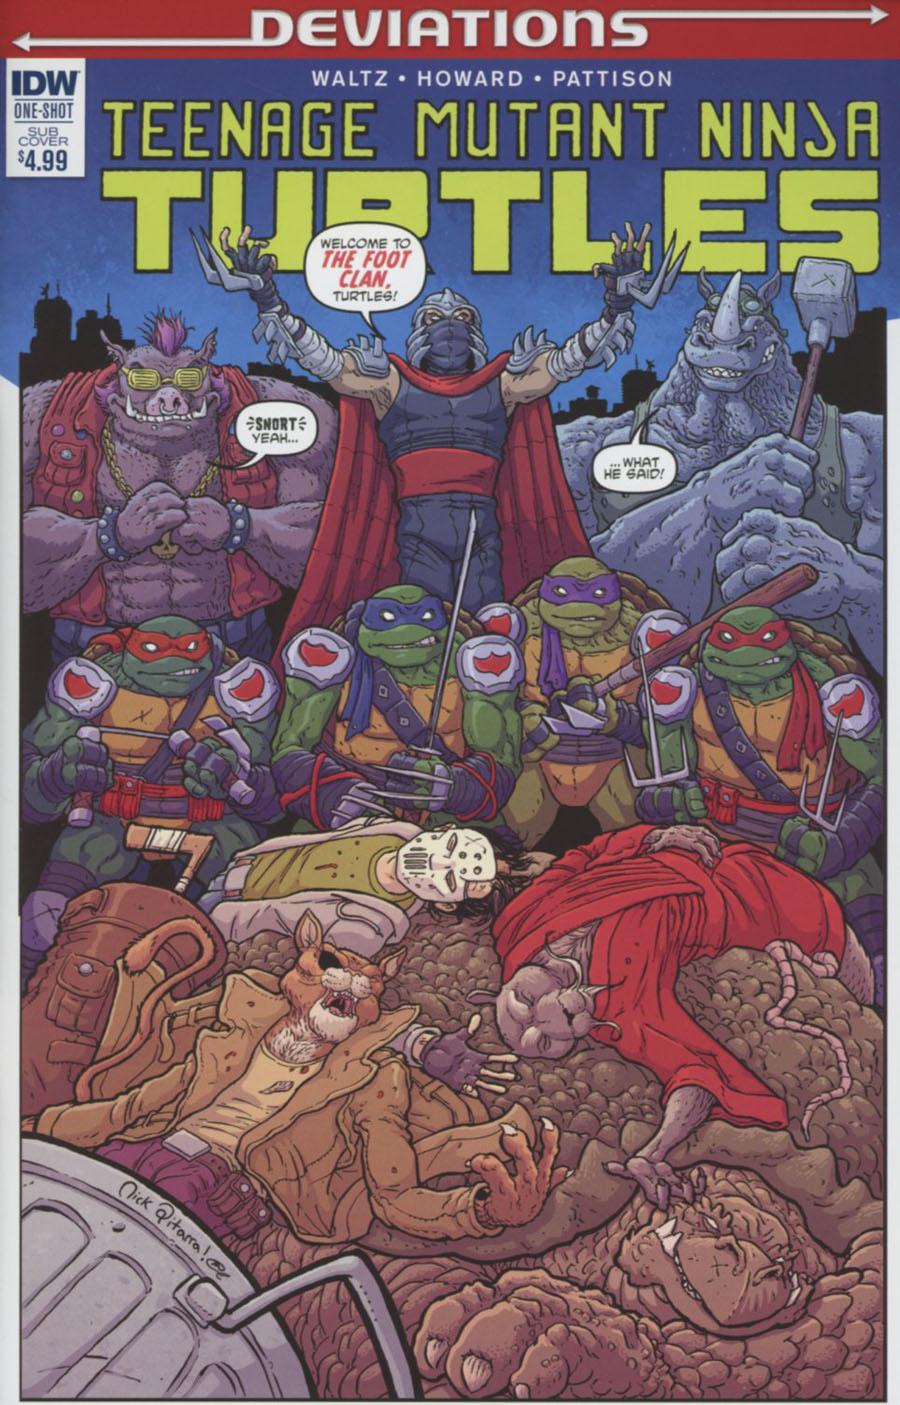 Teenage Mutant Ninja Turtles Deviations One Shot Cover B Variant Nick Pitarra Subscription Cover